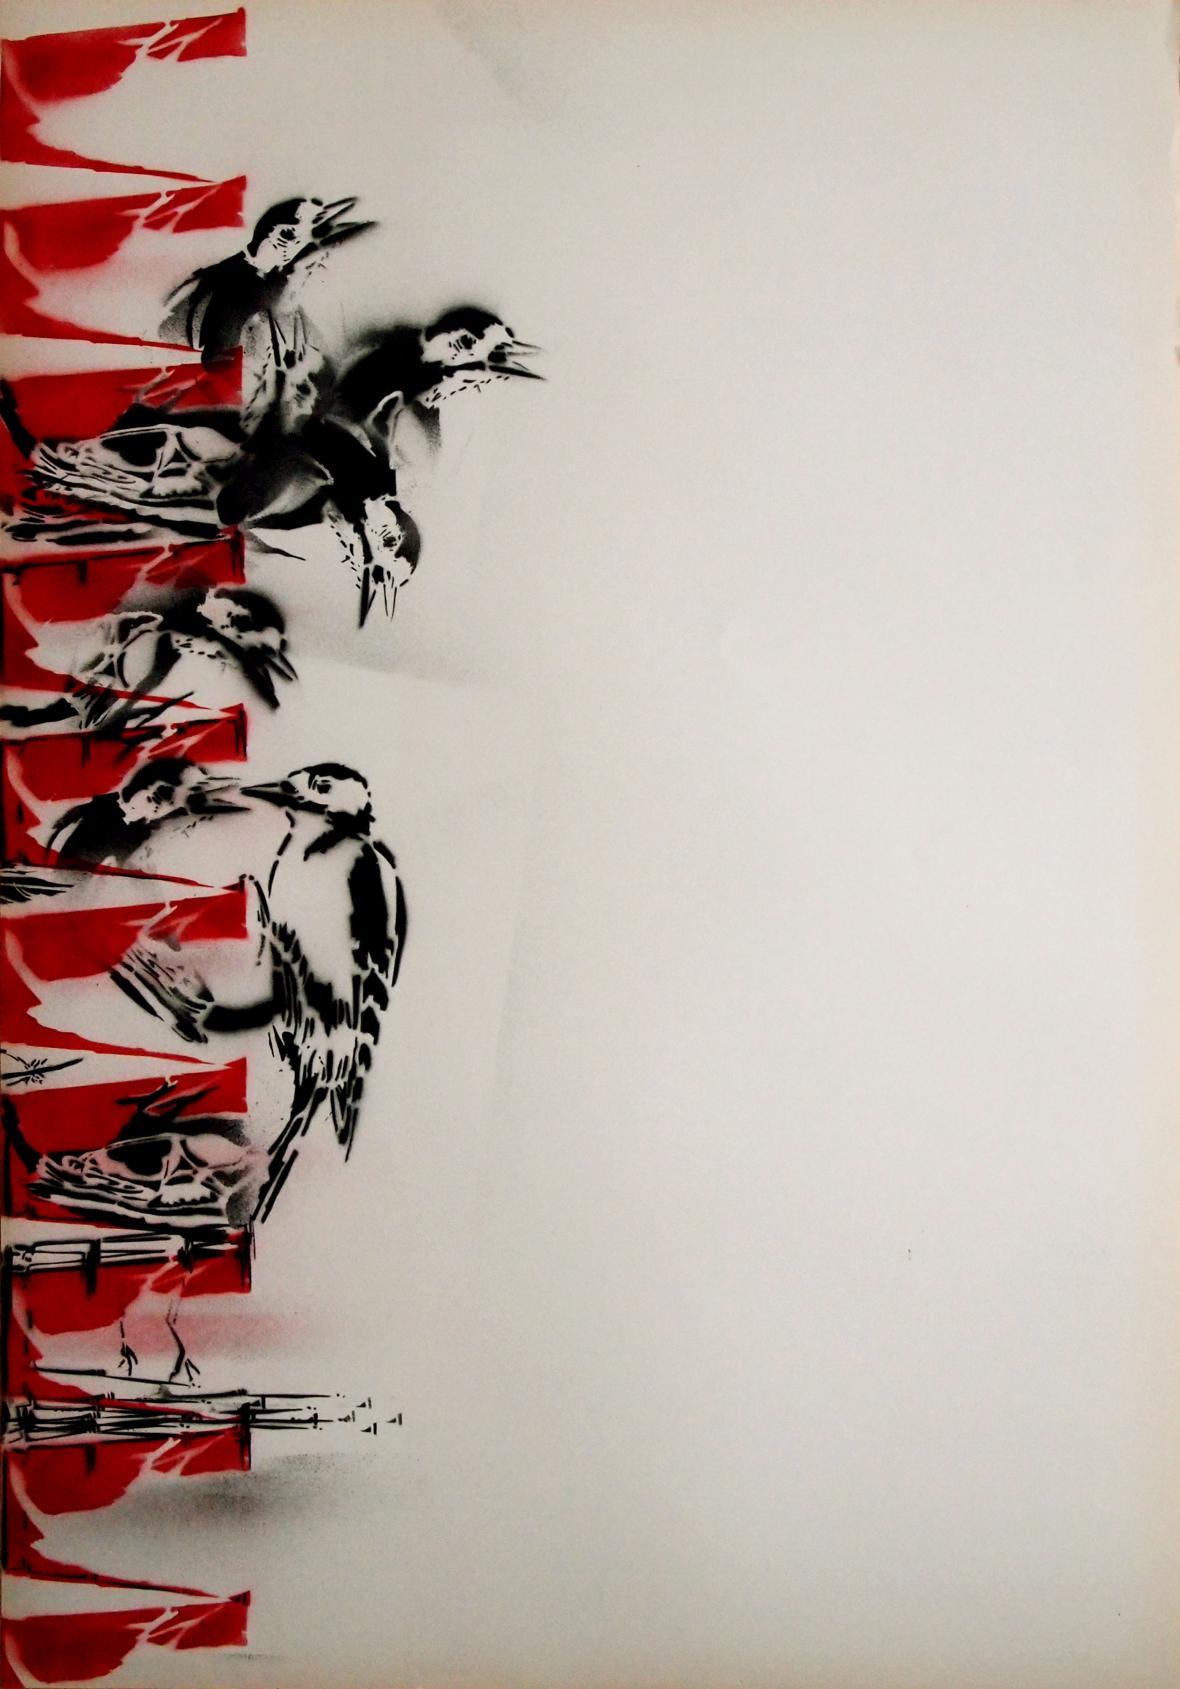 Markéta Hlinovská / z cyklu Hnízda a pasti, Krmení, 2012, sprej na papíře